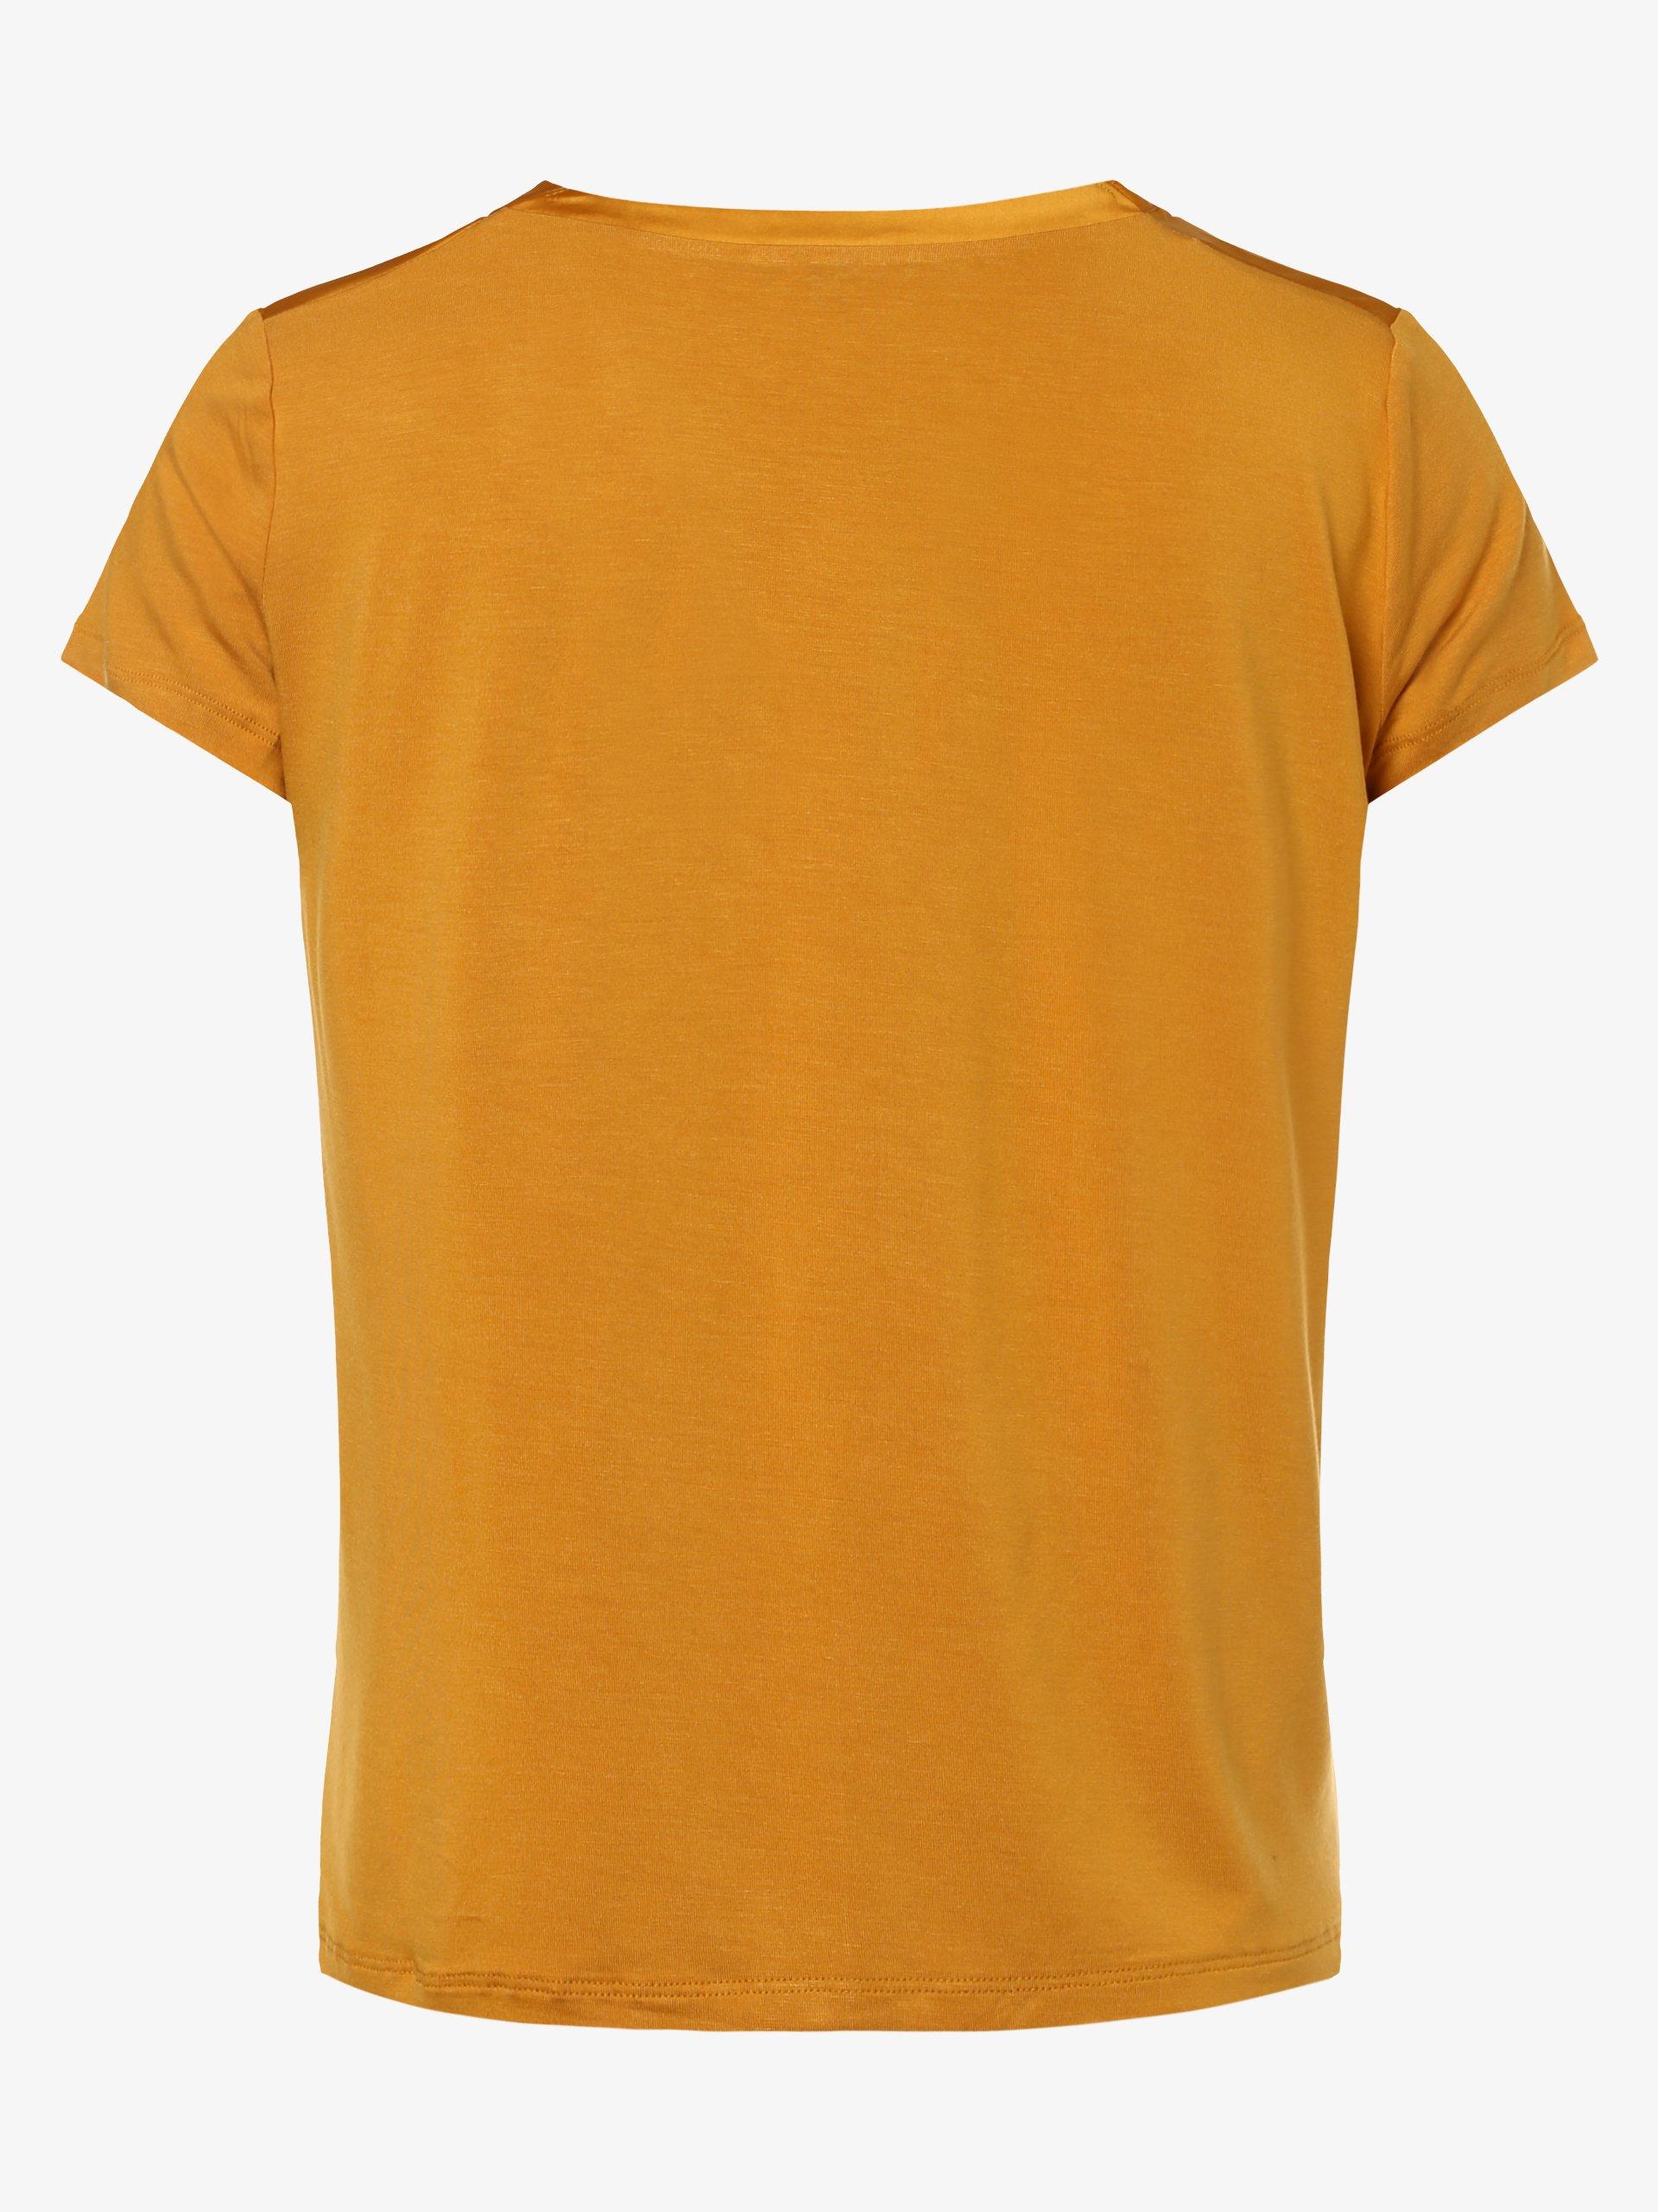 More & More Damen T-Shirt